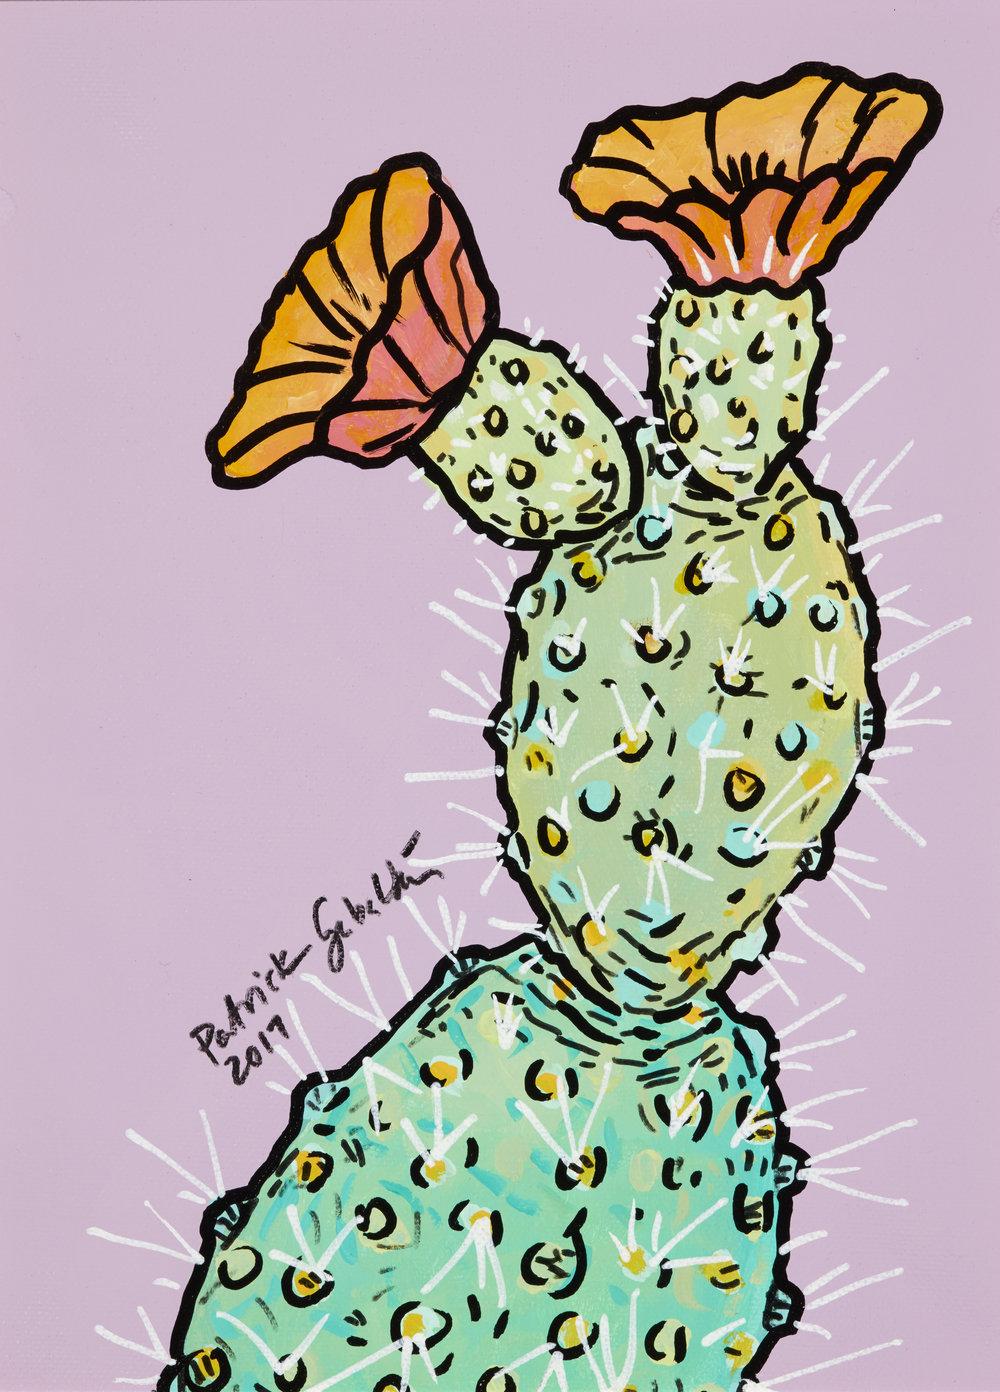 Prickly_2.jpg